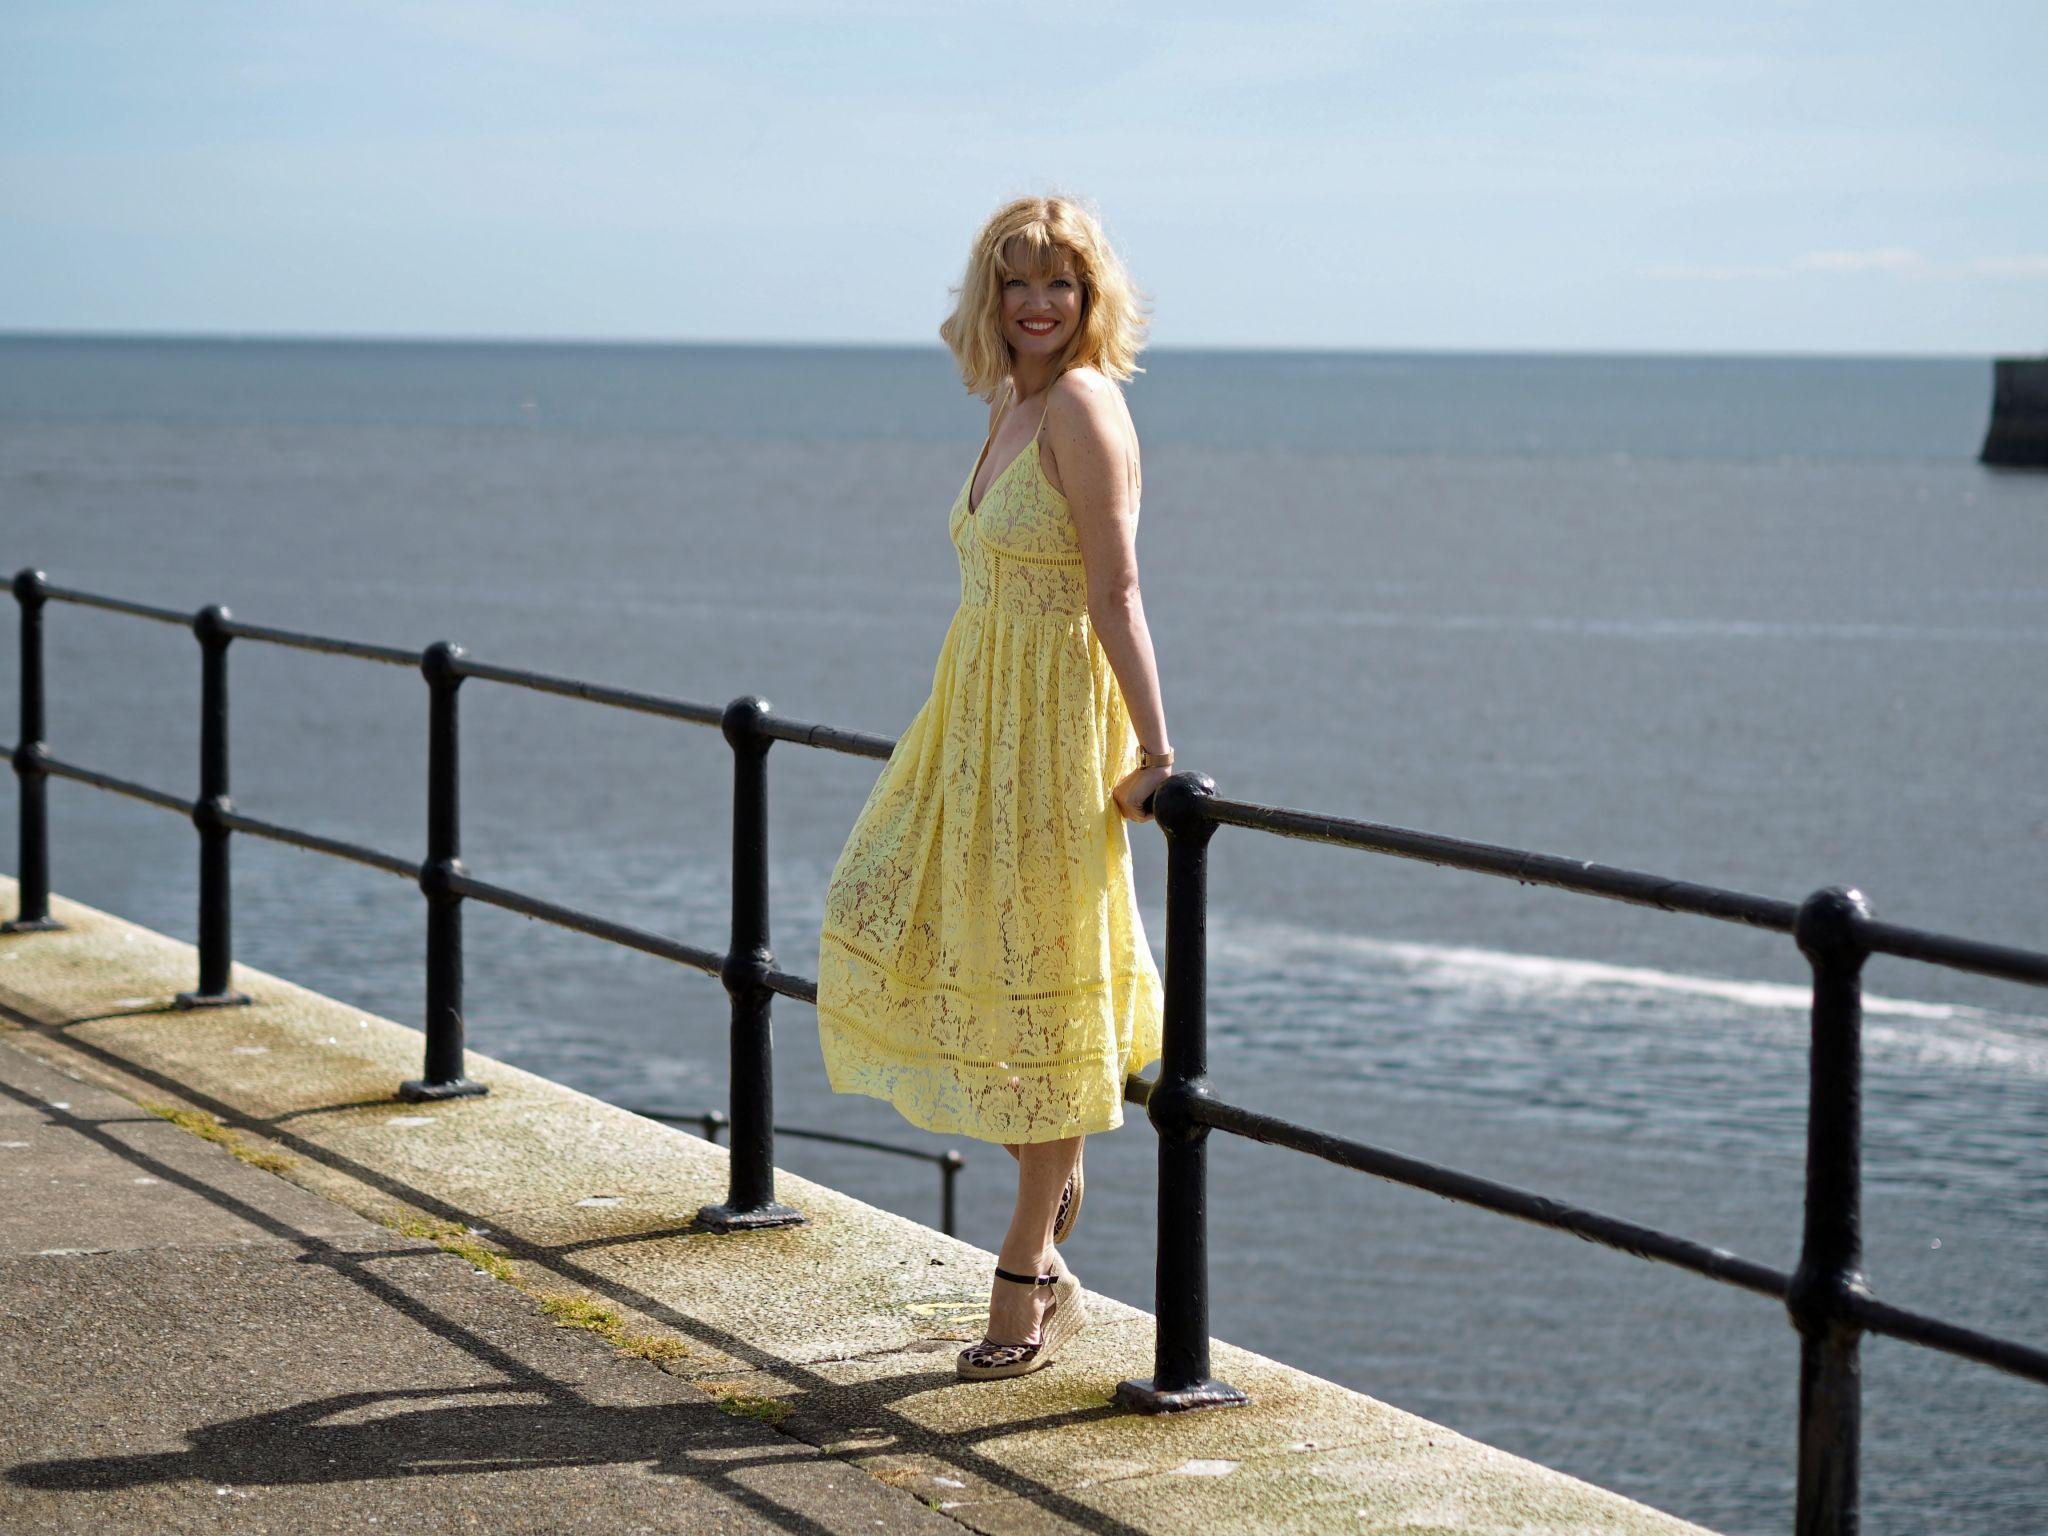 yellow-lace-midi-dress-leopard-espadrilles-pier